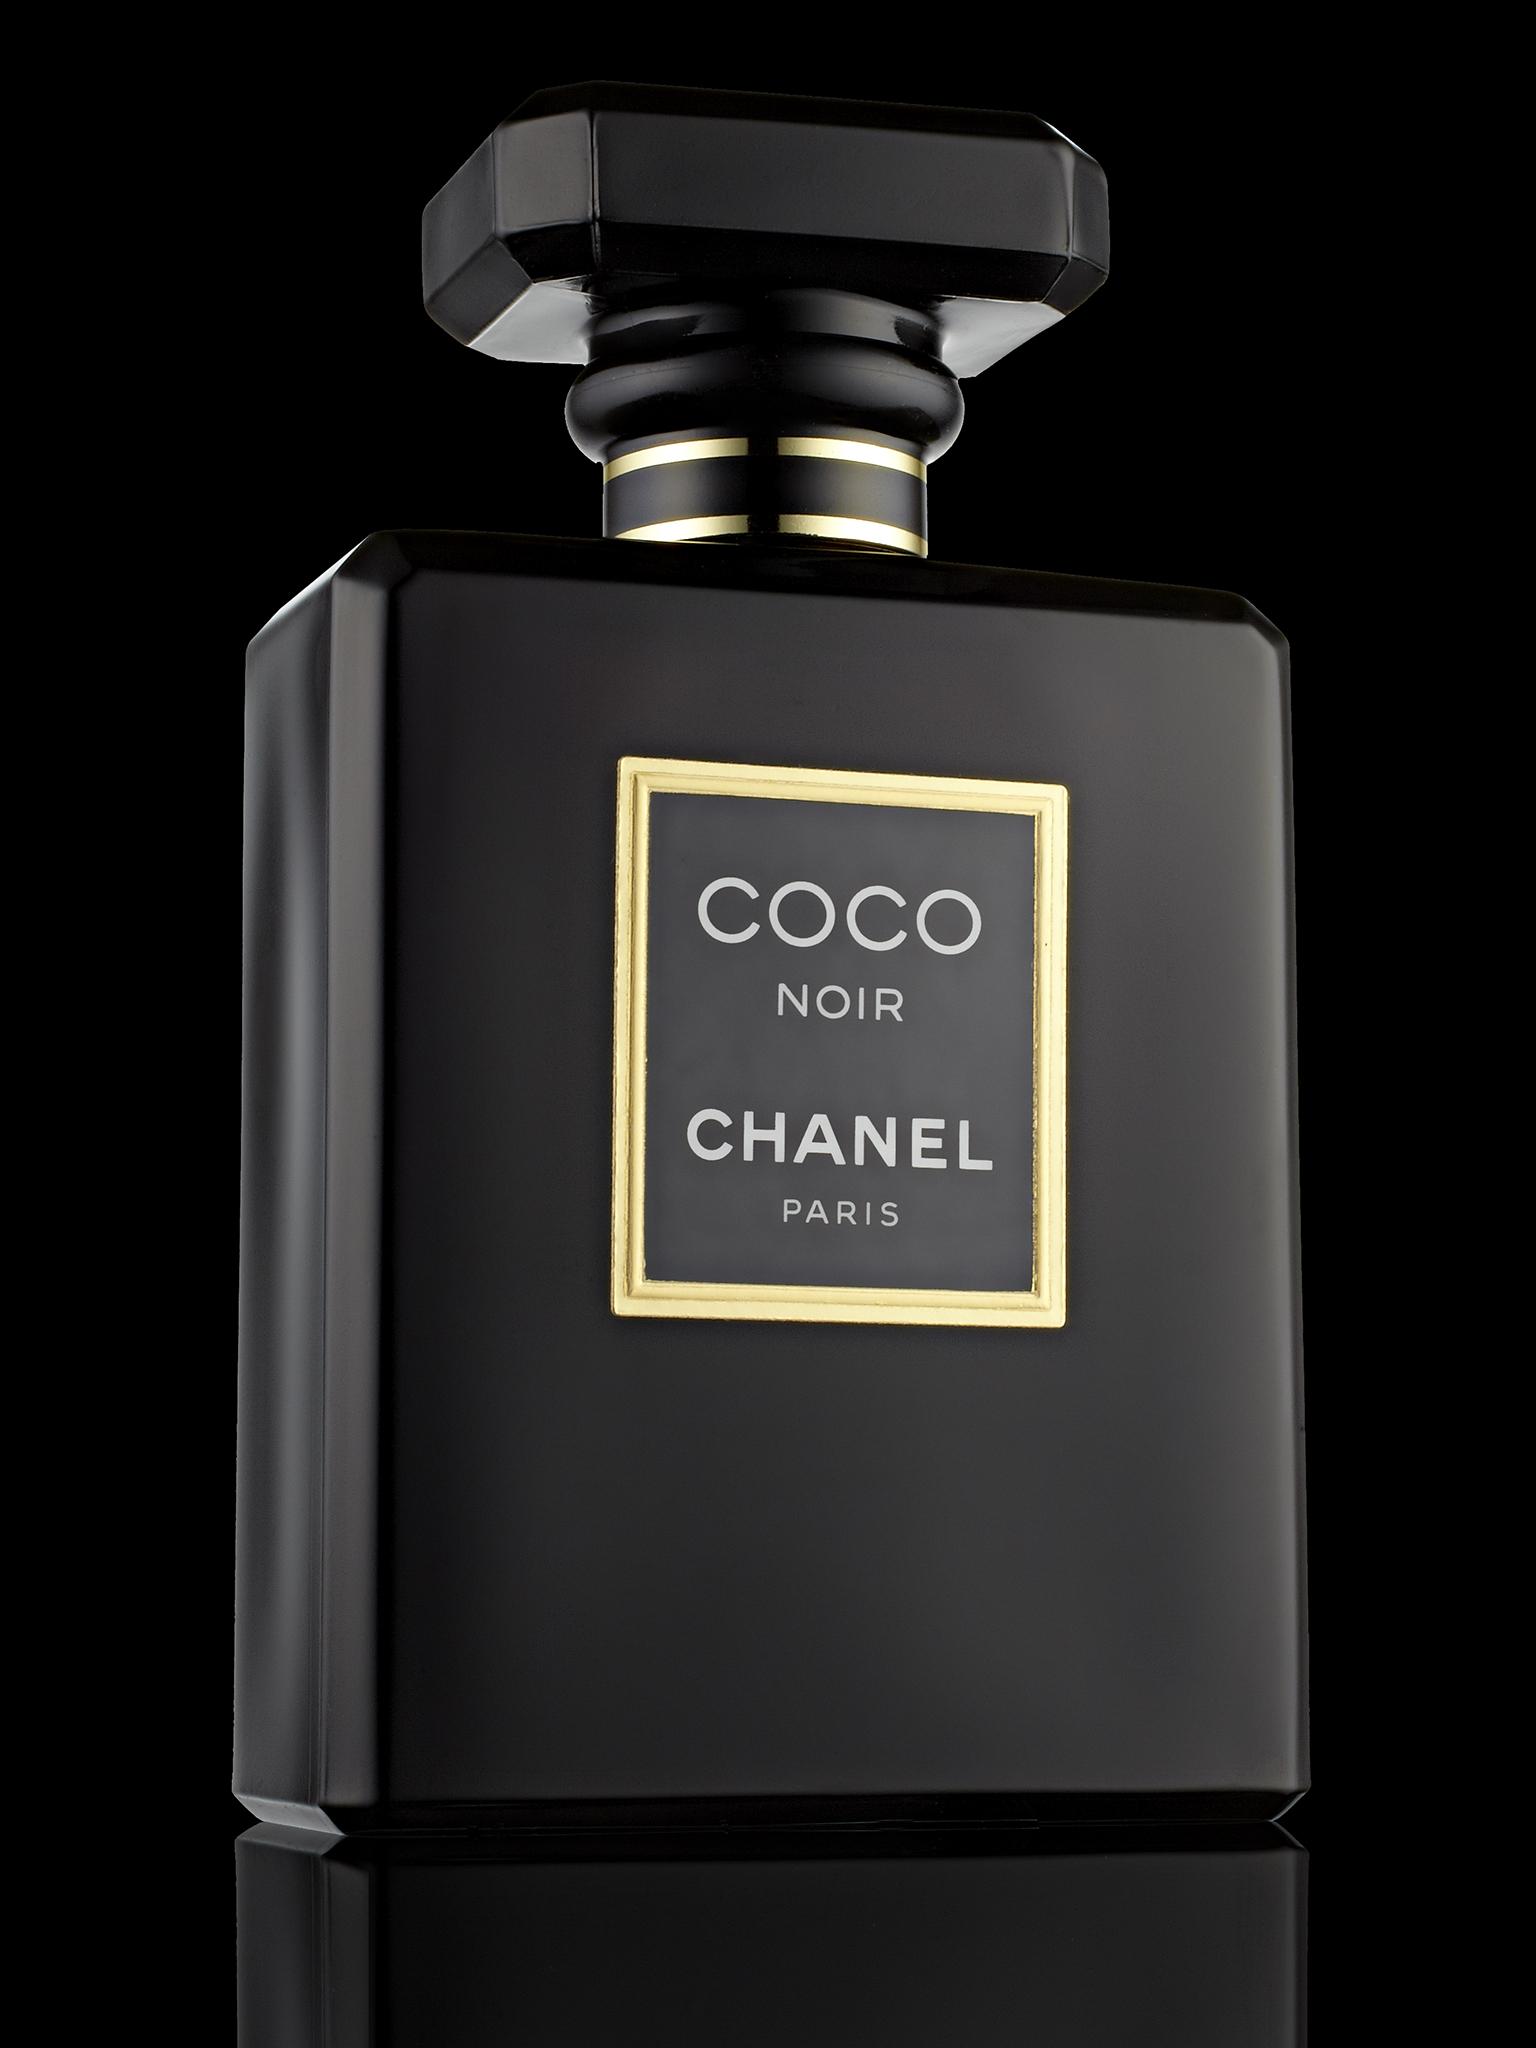 012-02-ChanelCoco-web.jpg